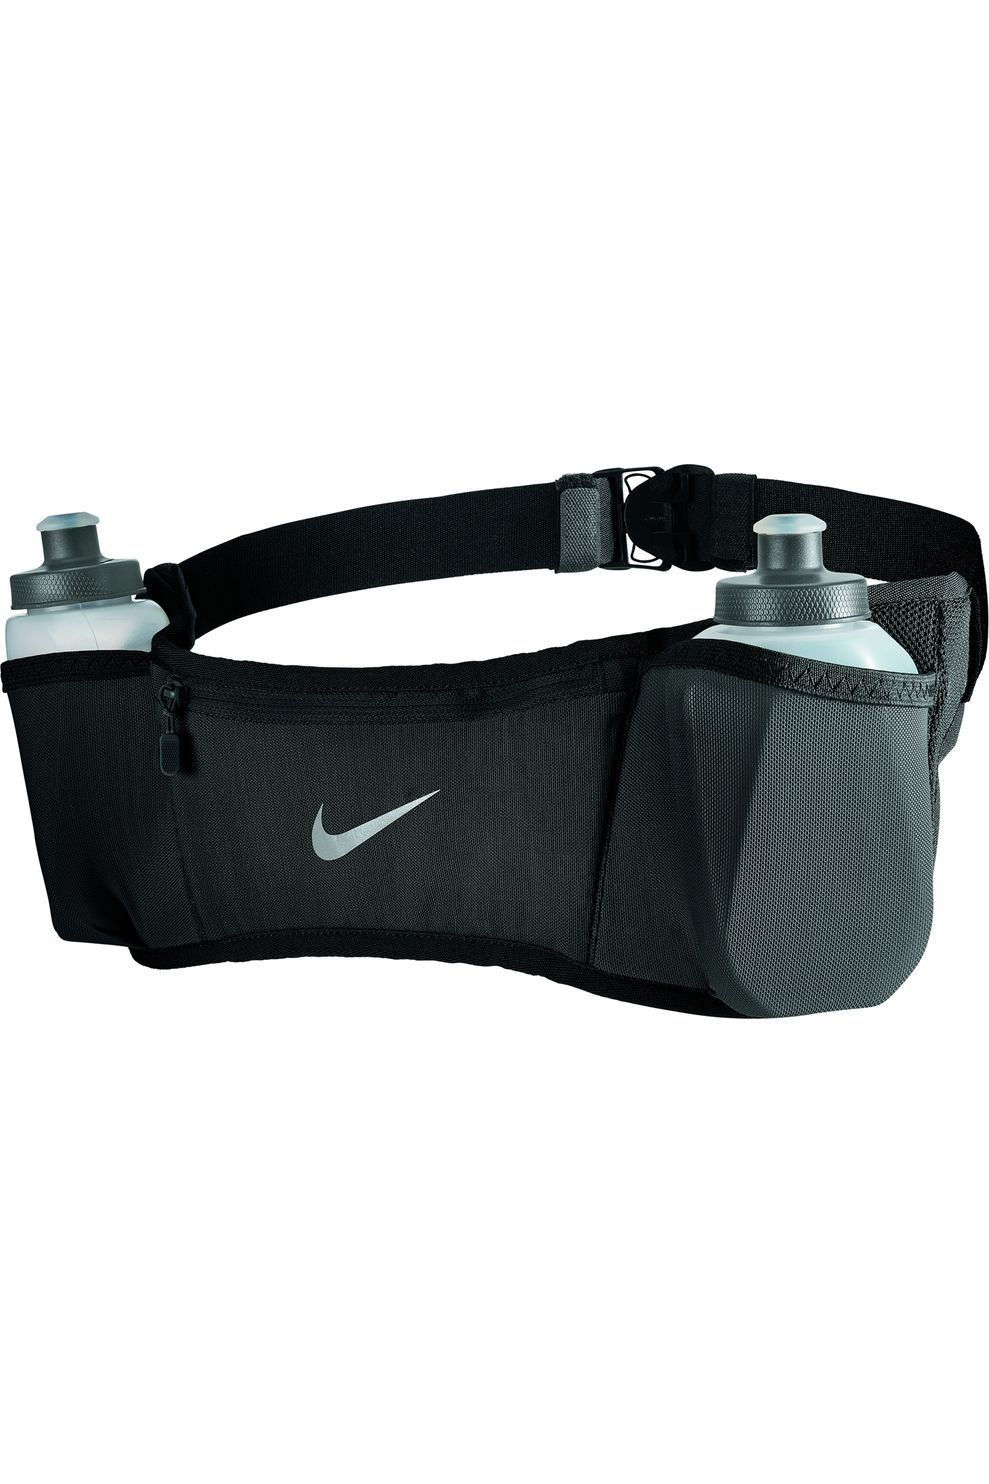 Nike Equipment Drinksysteem Double Pocket Belt 20Oz 2.O - Zwart